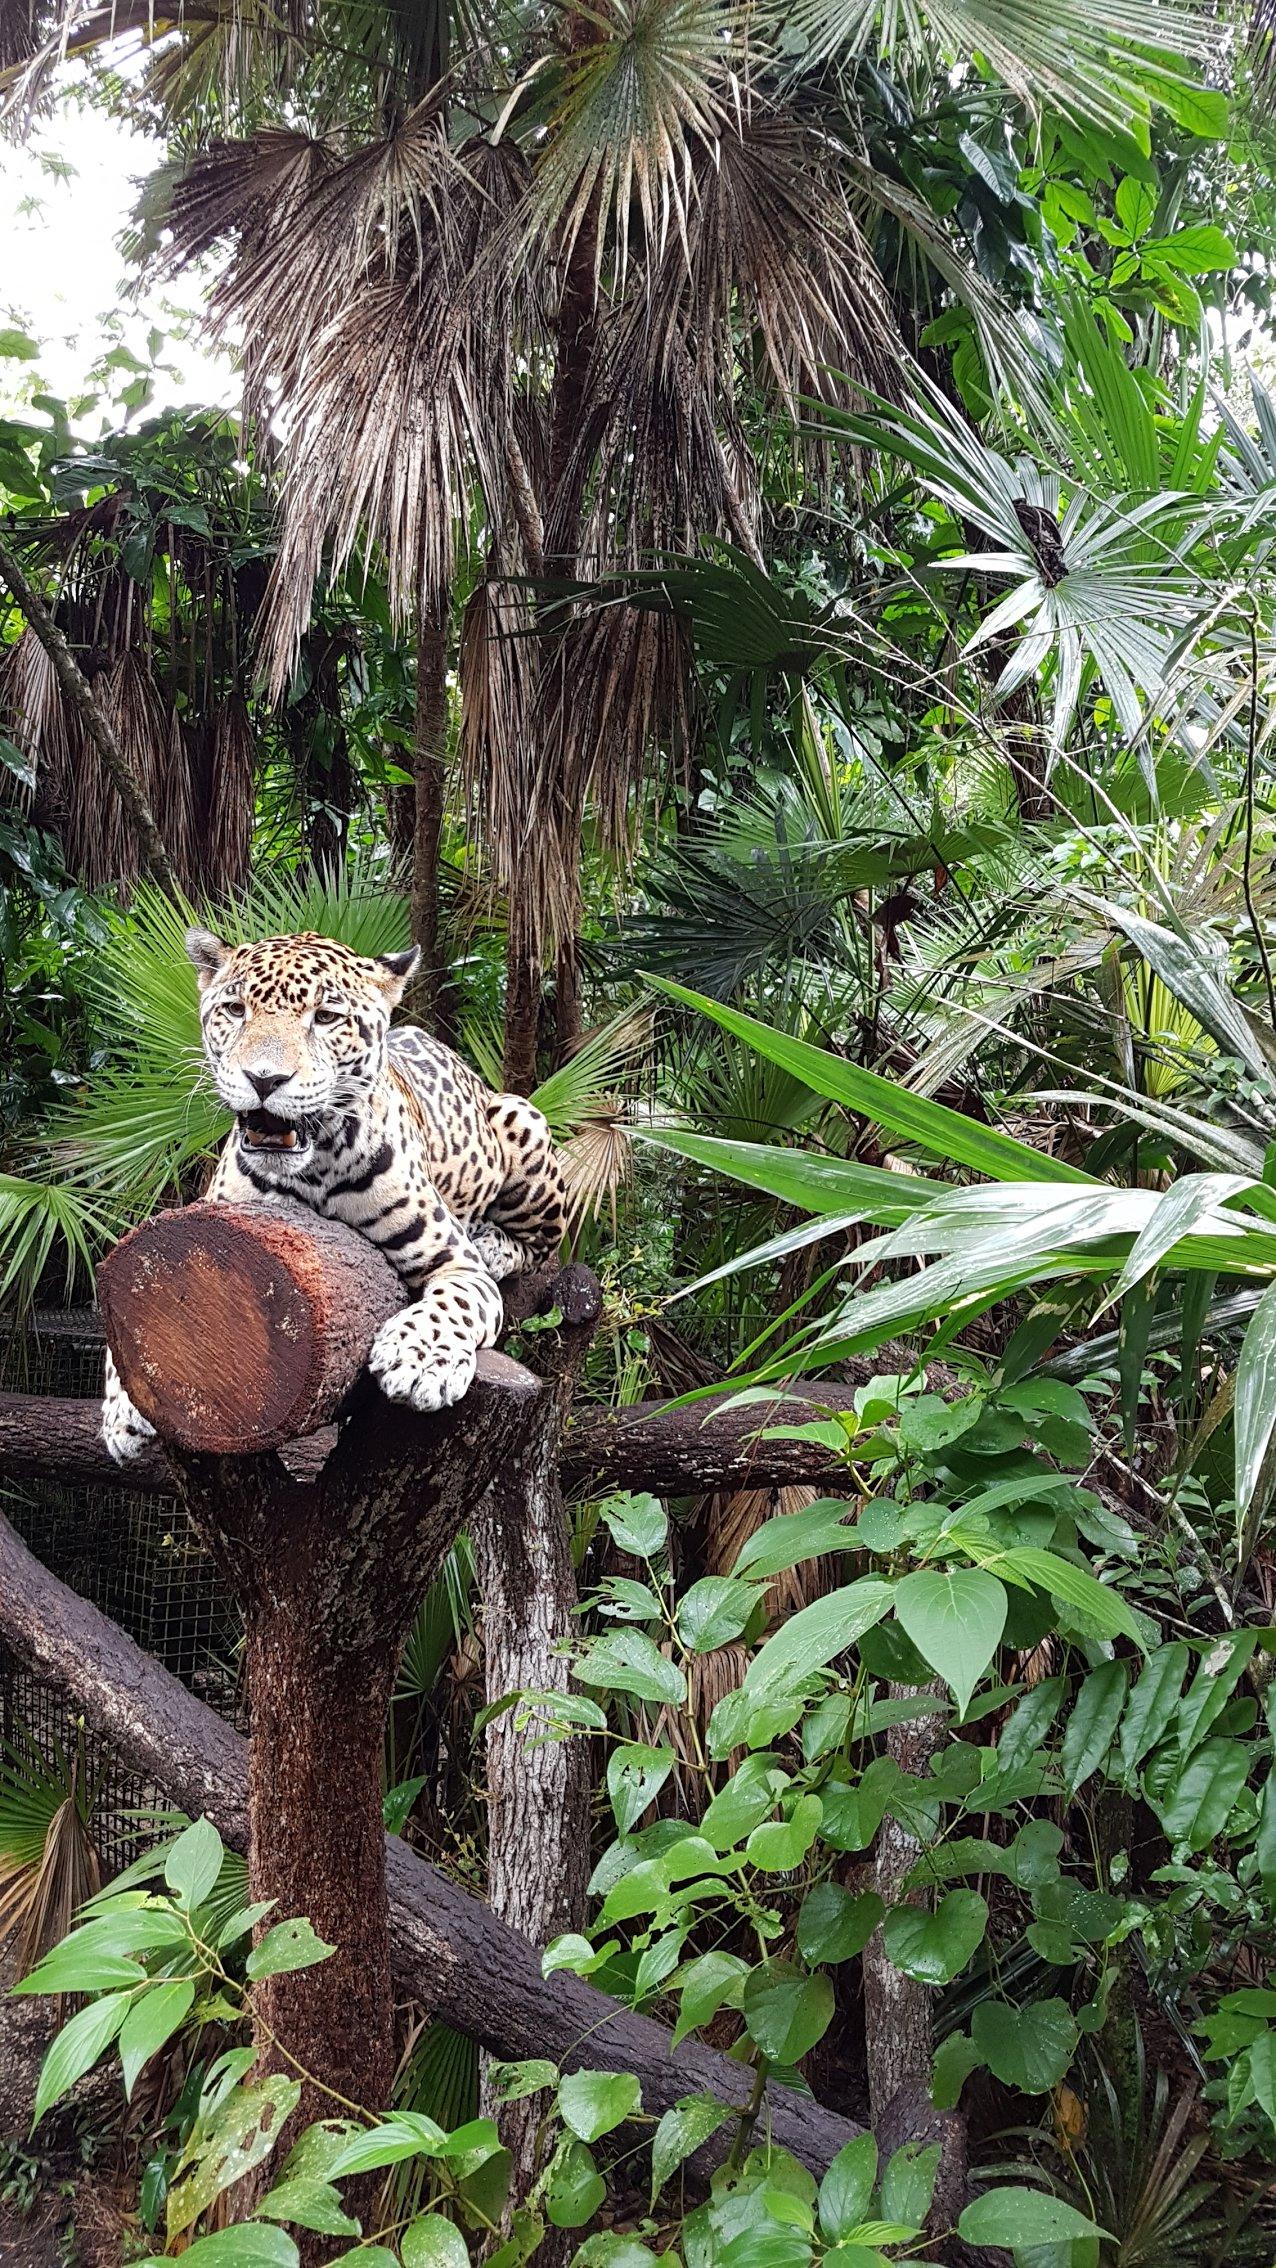 Junior Buddy the jaguar at Belize Zoo